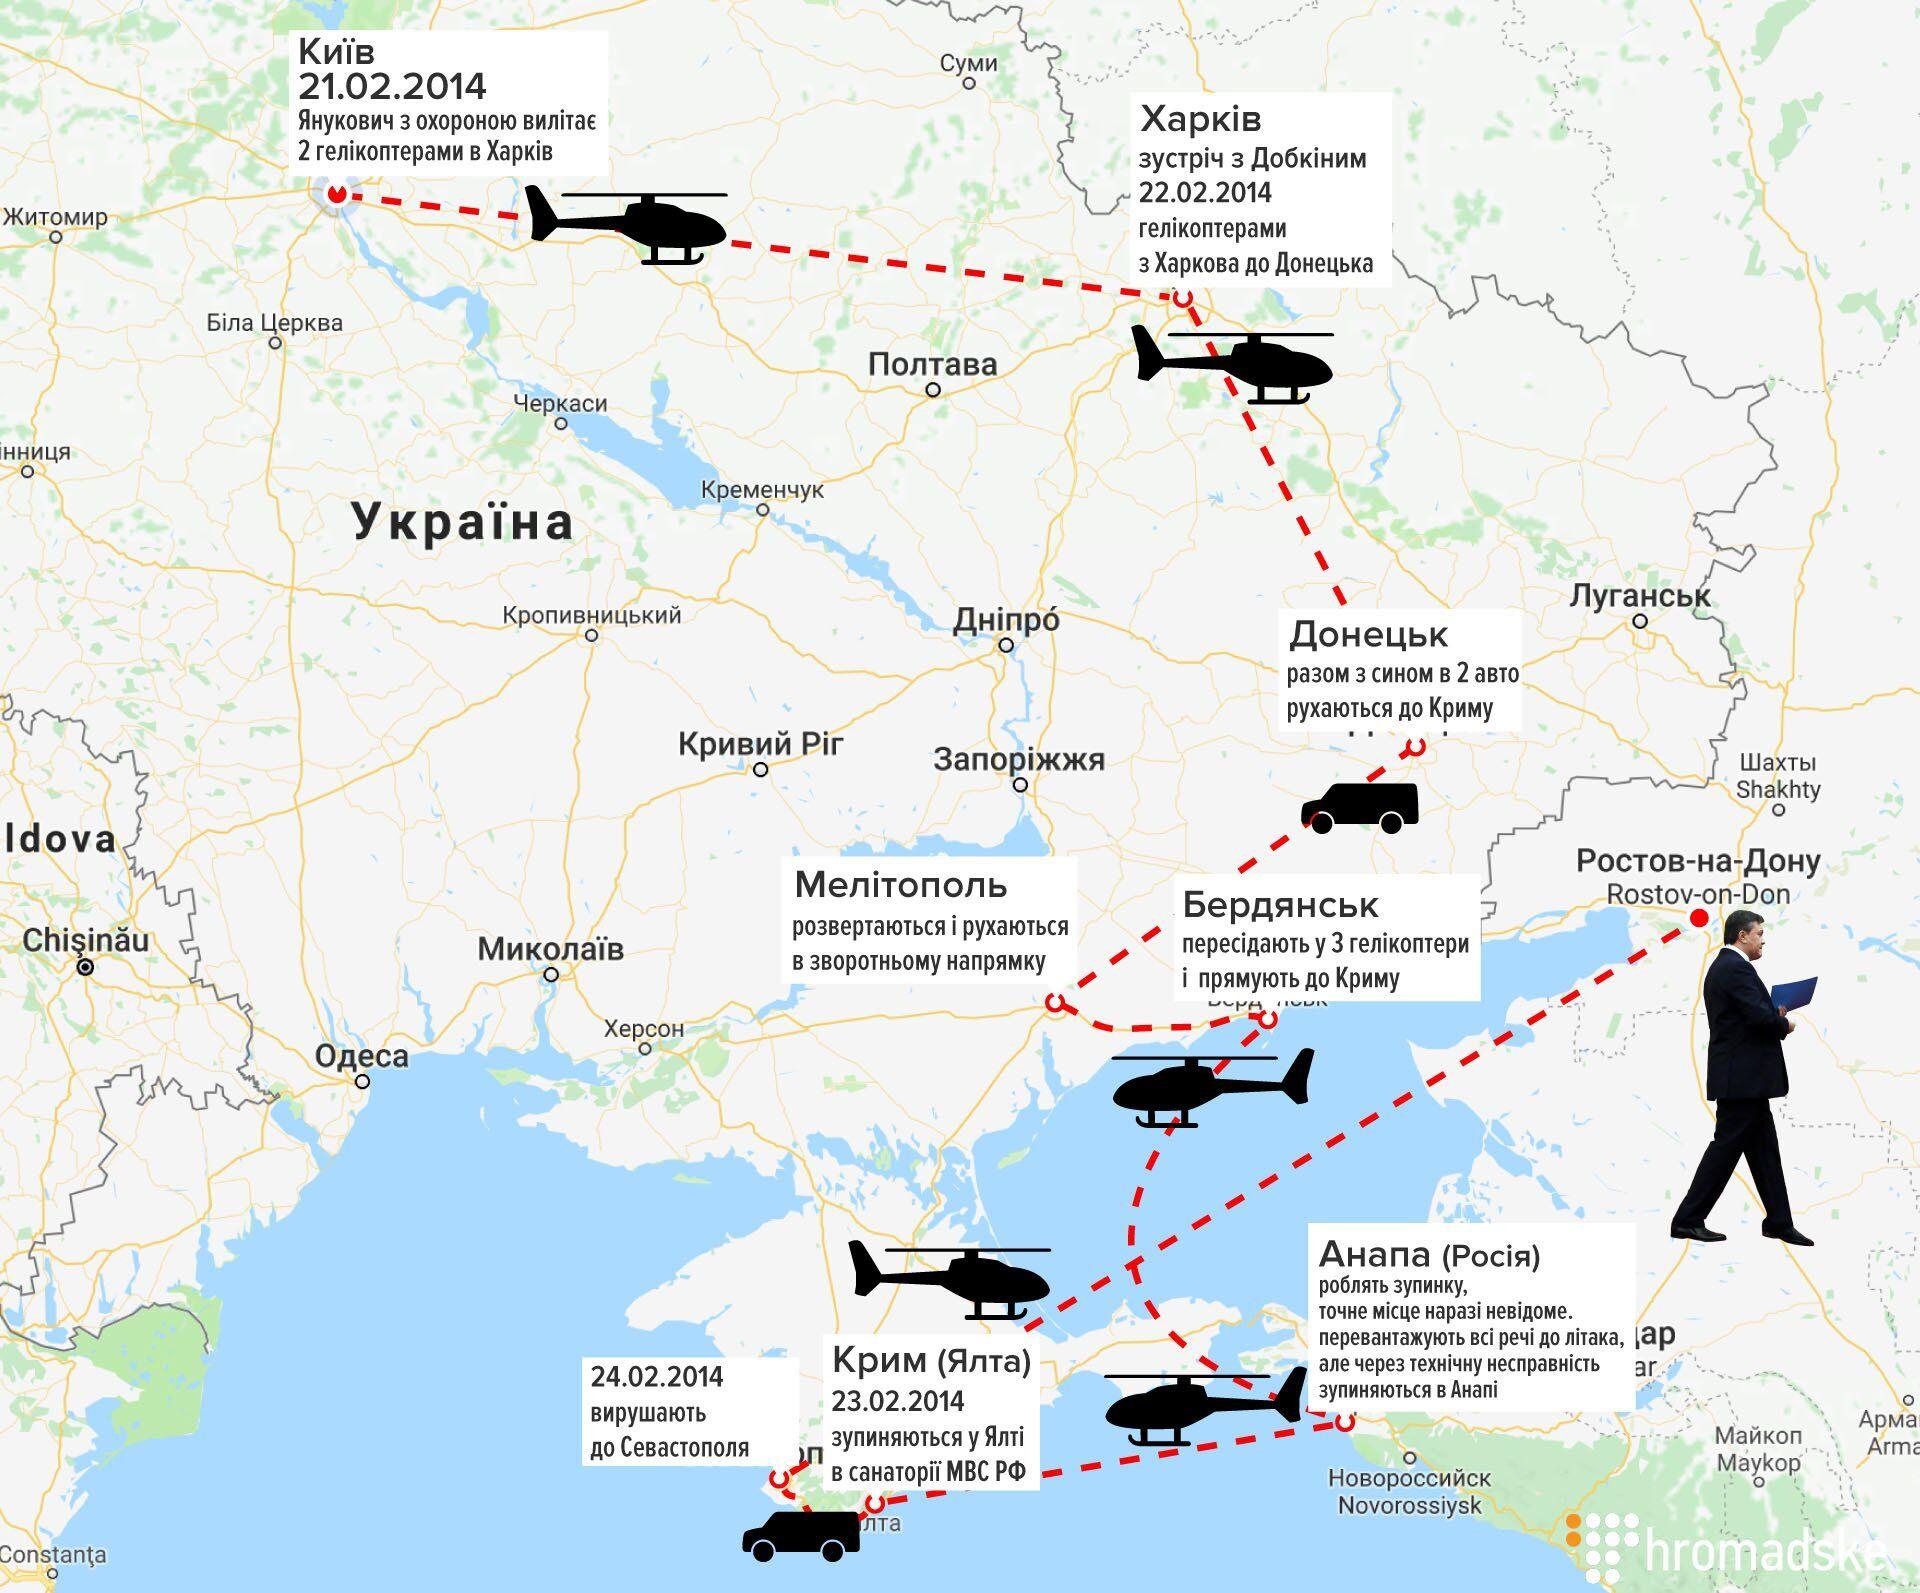 Схема бегства Виктора Януковича